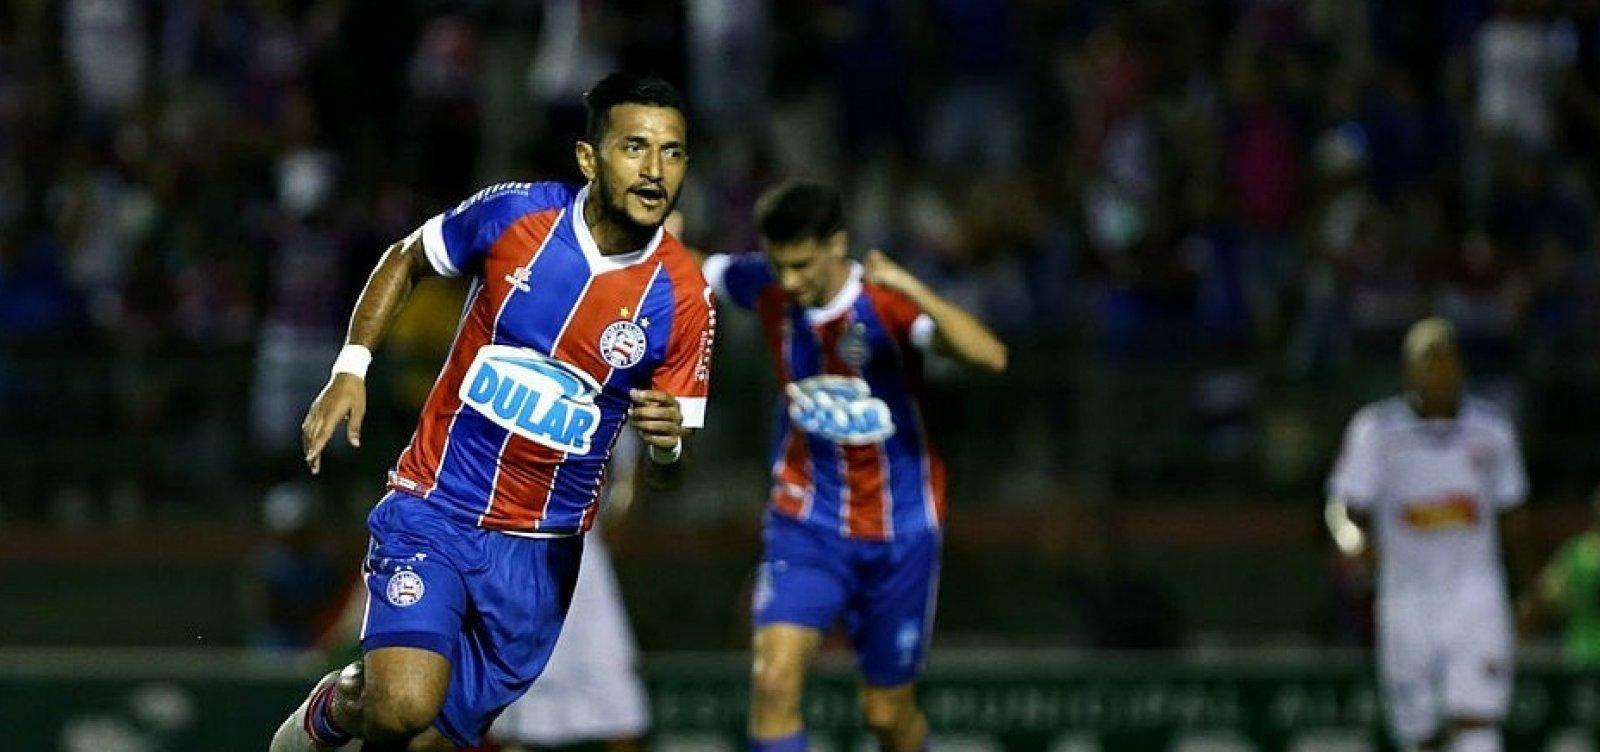 Cotado para titular contra o Palmeiras, Rogério é vetado pelo departamento médico do Bahia